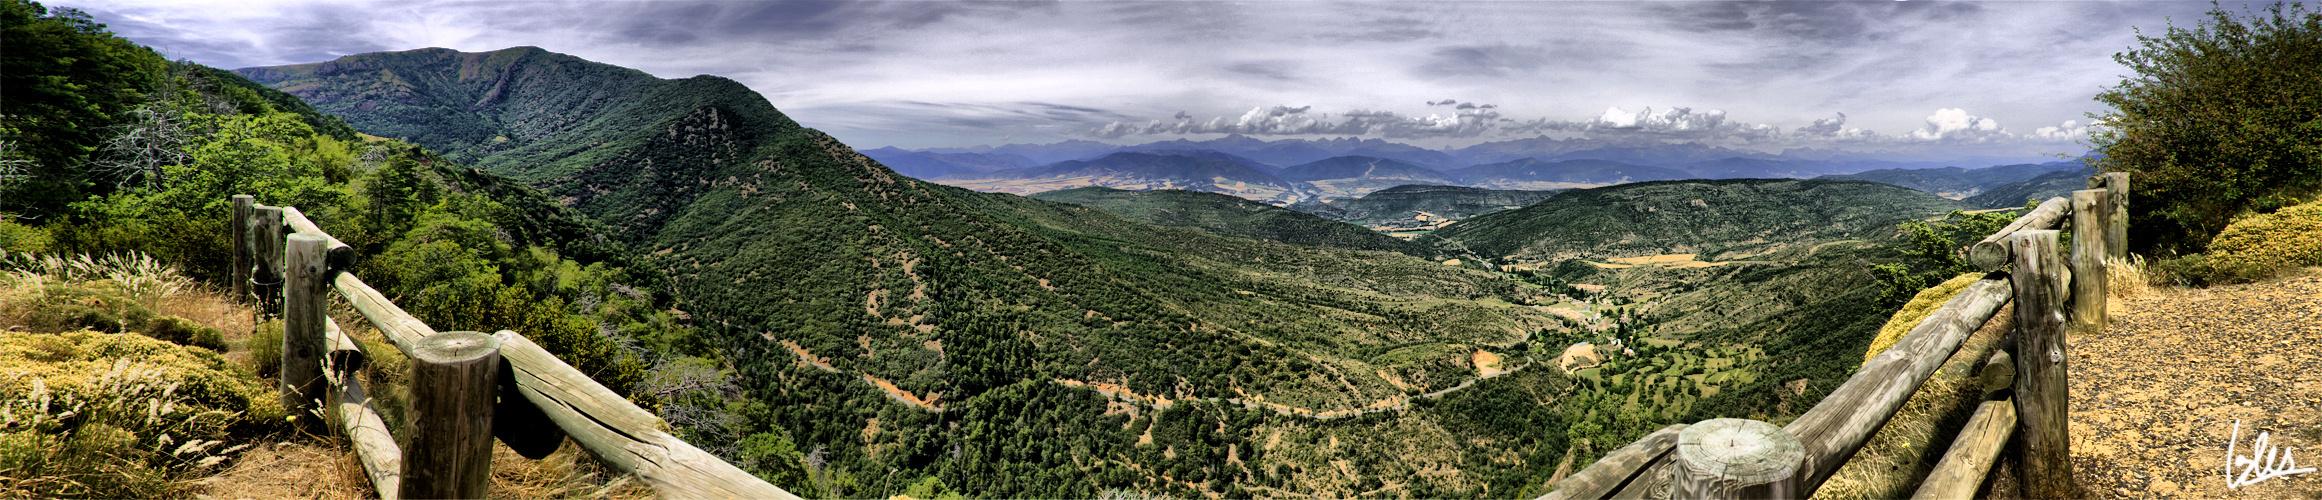 Pirineo Aragonés desde San Juan de la Peña (Huesca)